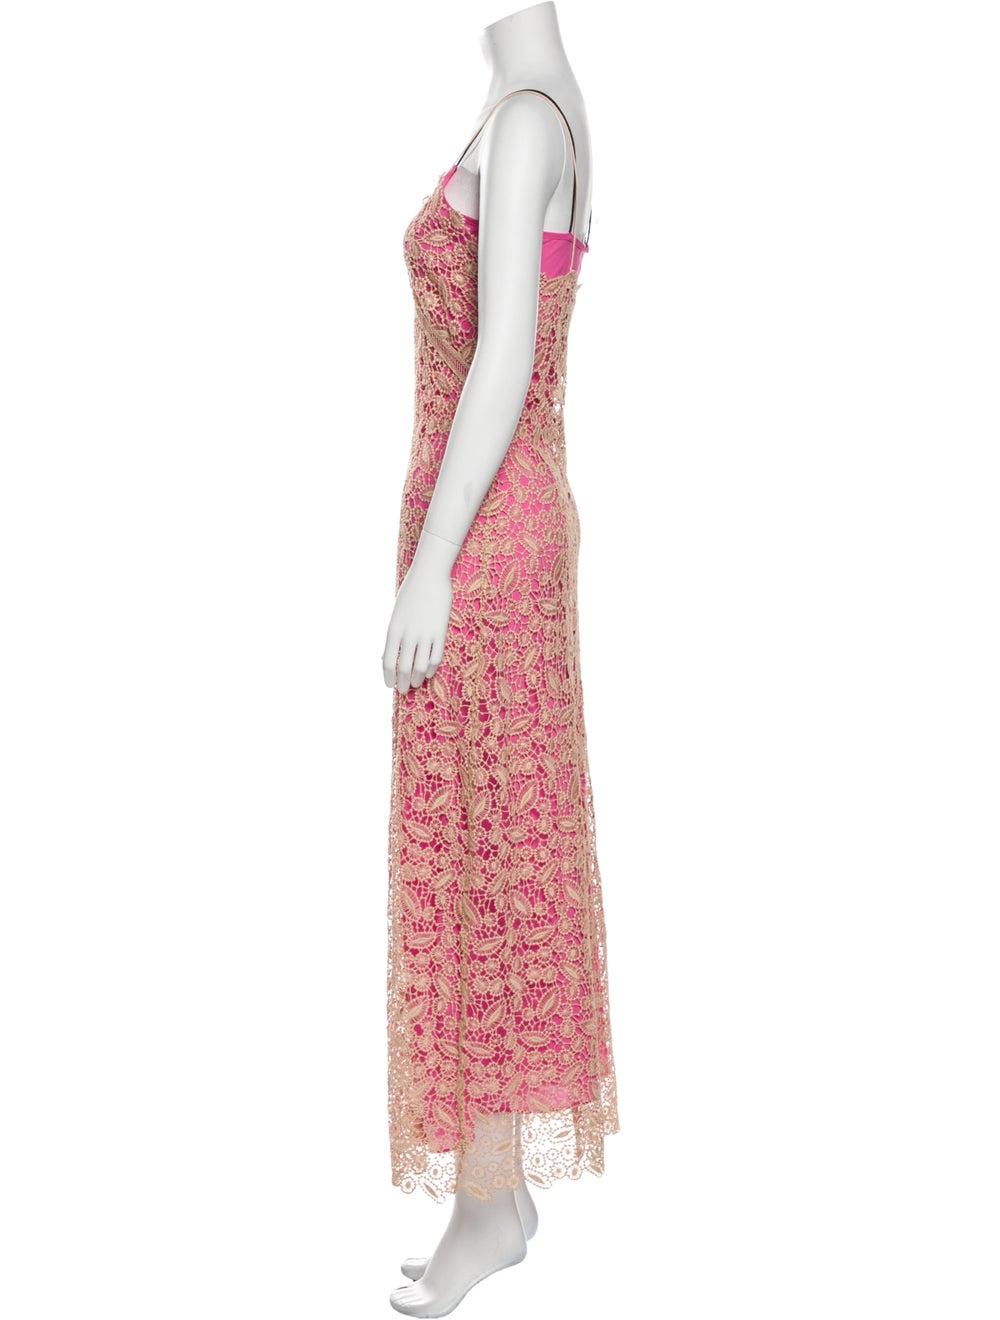 Self-Portrait Lace Pattern Long Dress Pink - image 2